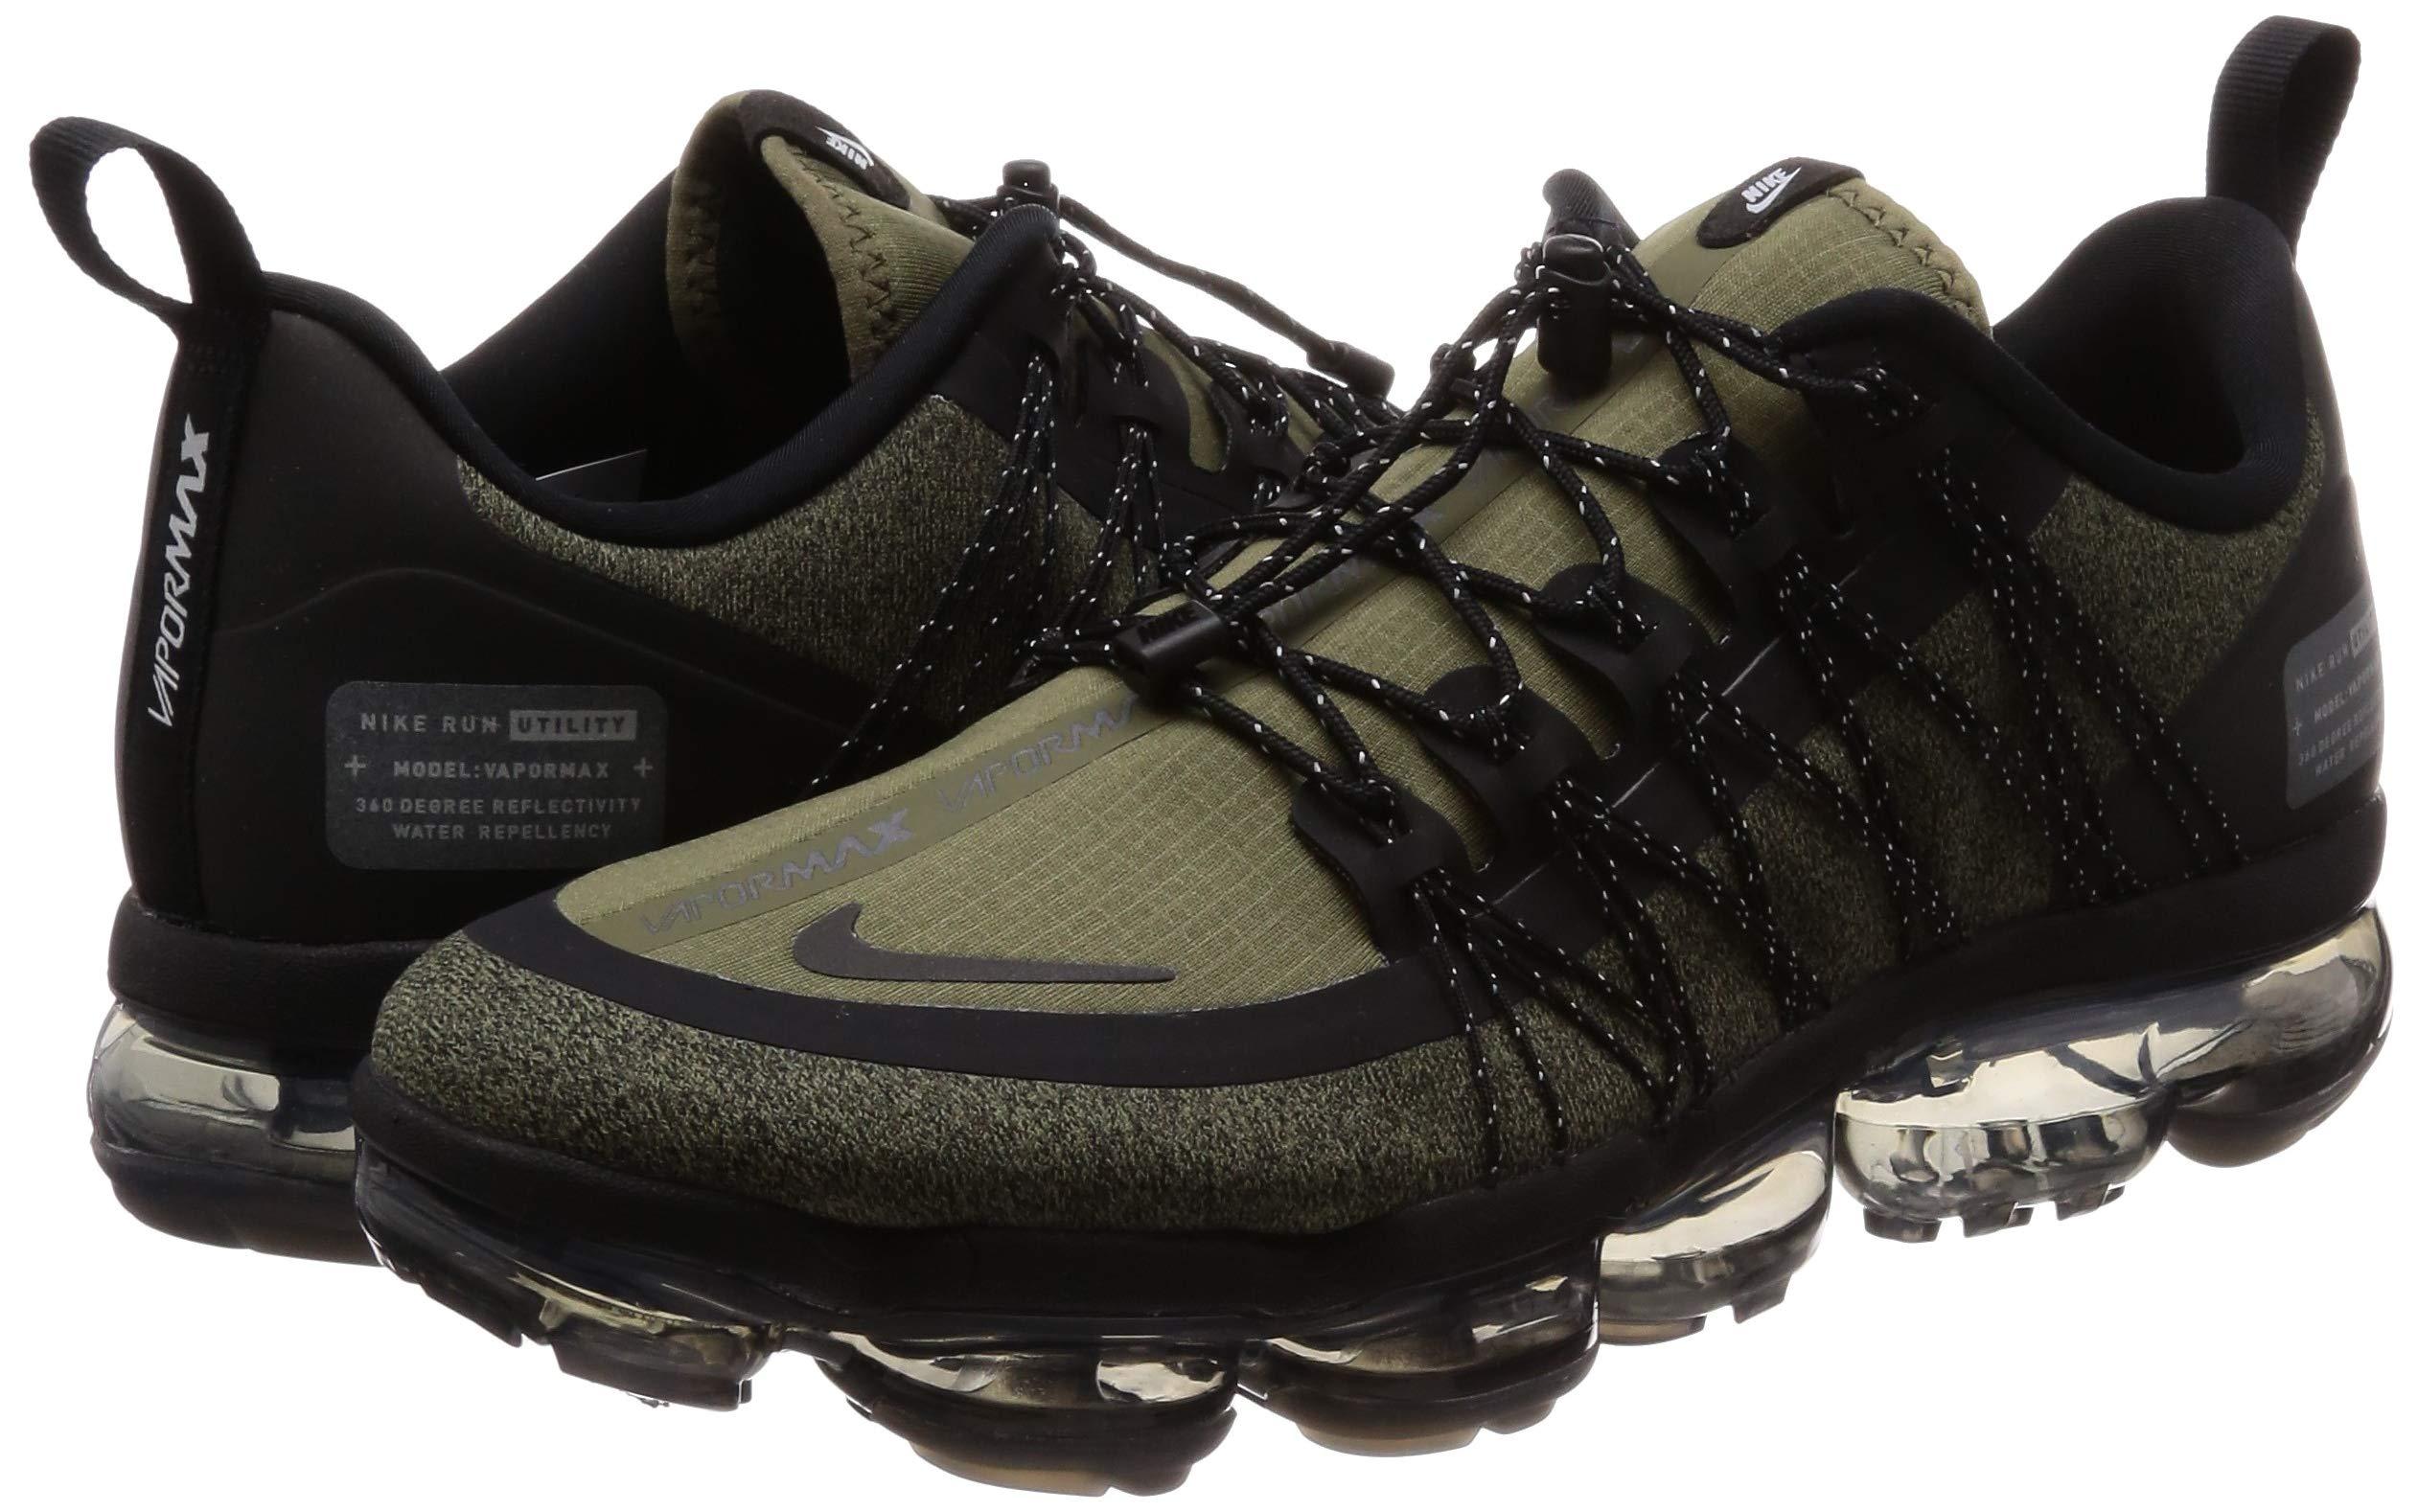 81KsnBONfqL - Nike Men's Air Vapormax Run Utility, Medium Olive/Reflect Silver